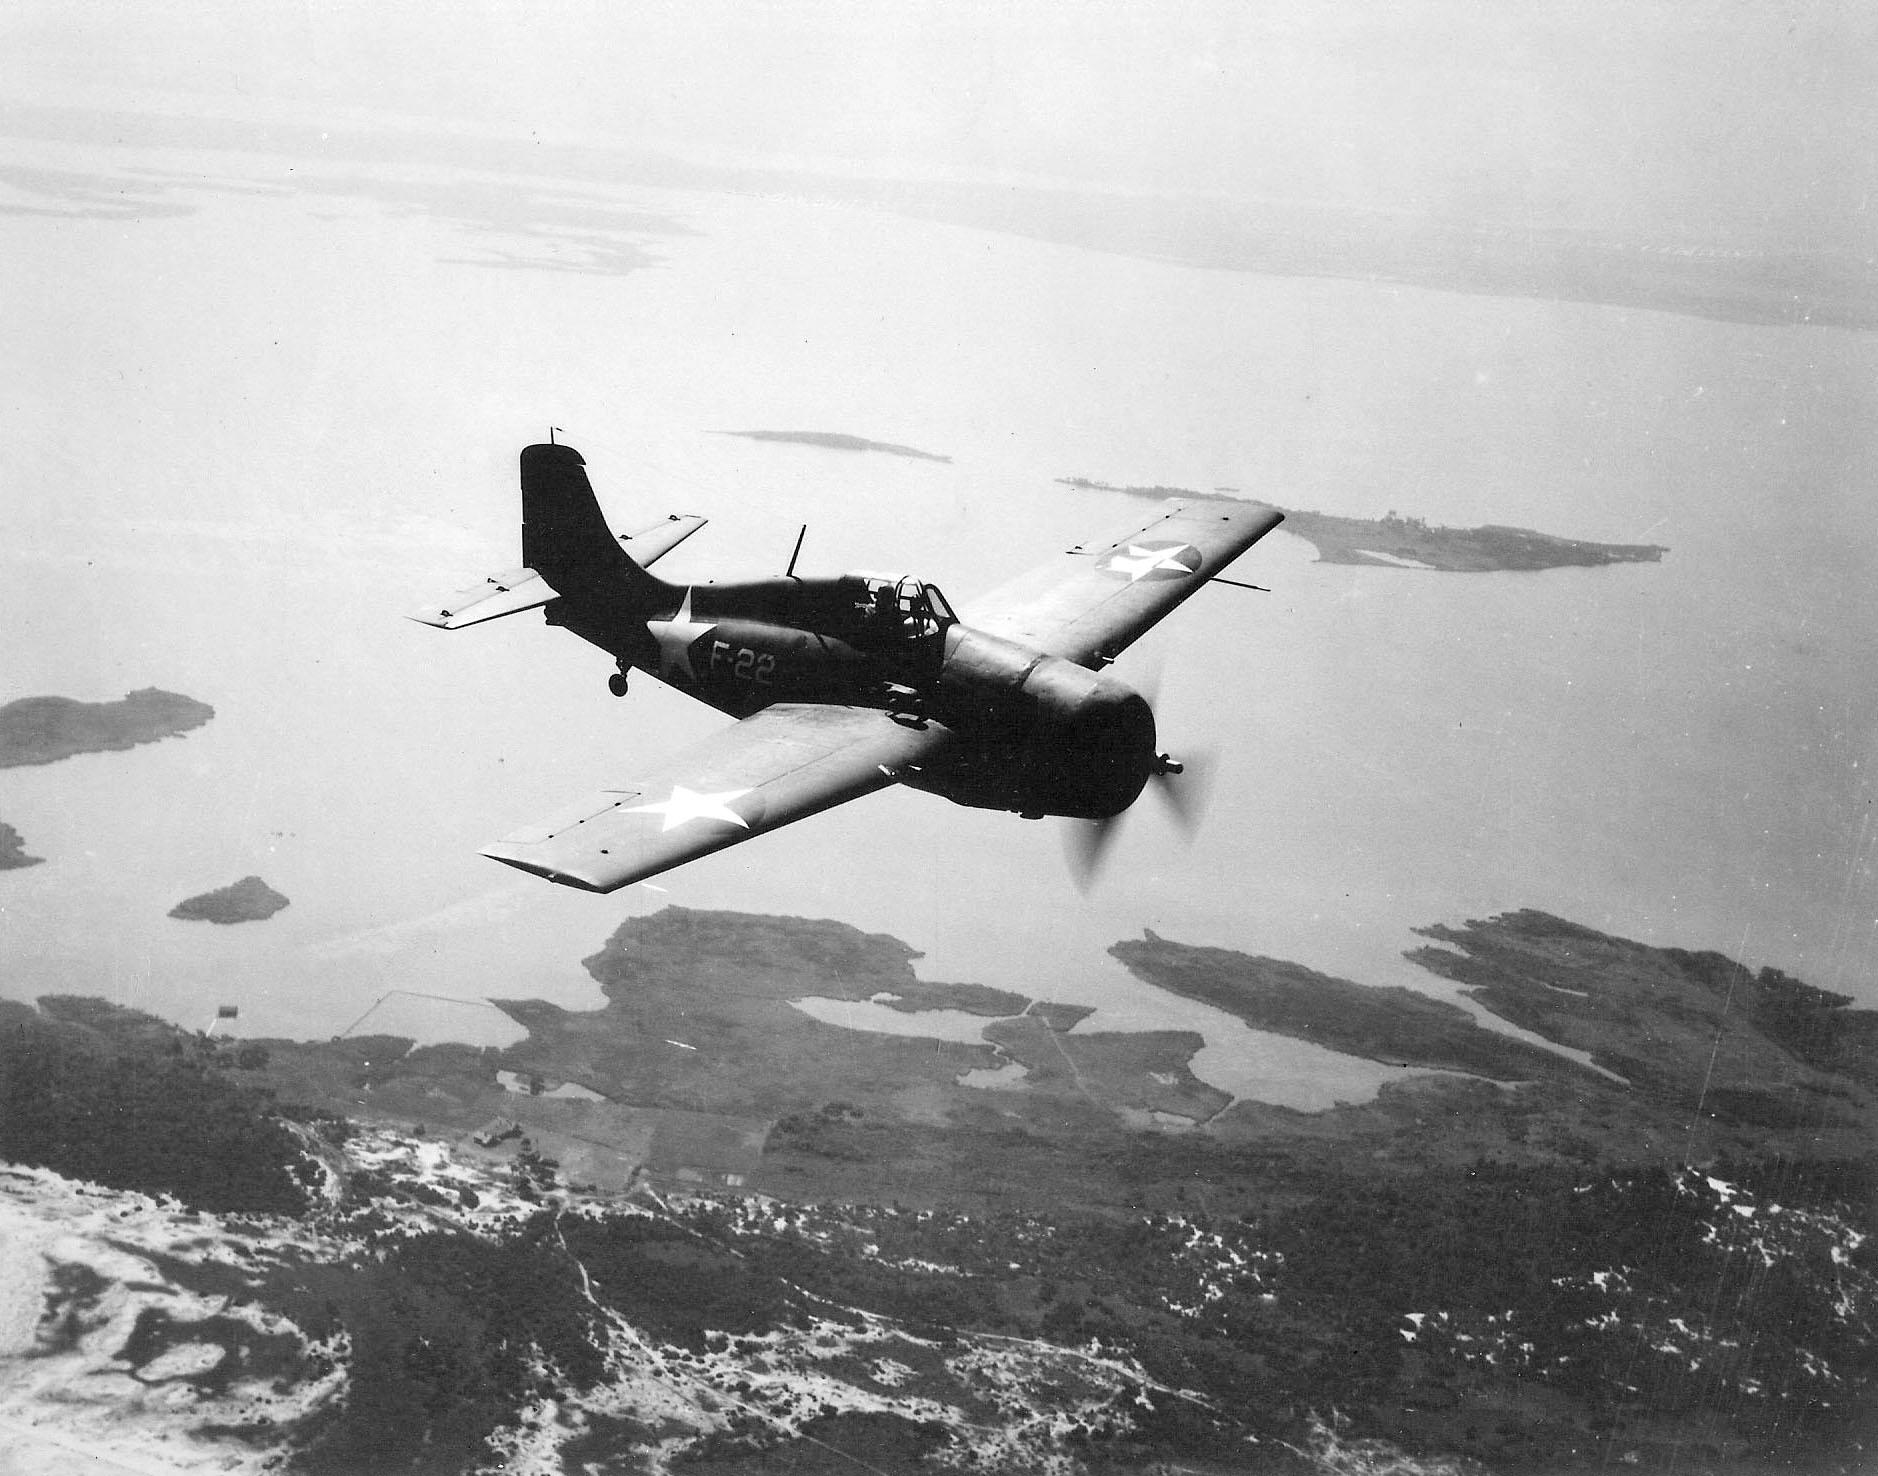 Grumman F4F 3 Wildcat White F22 in flight 01